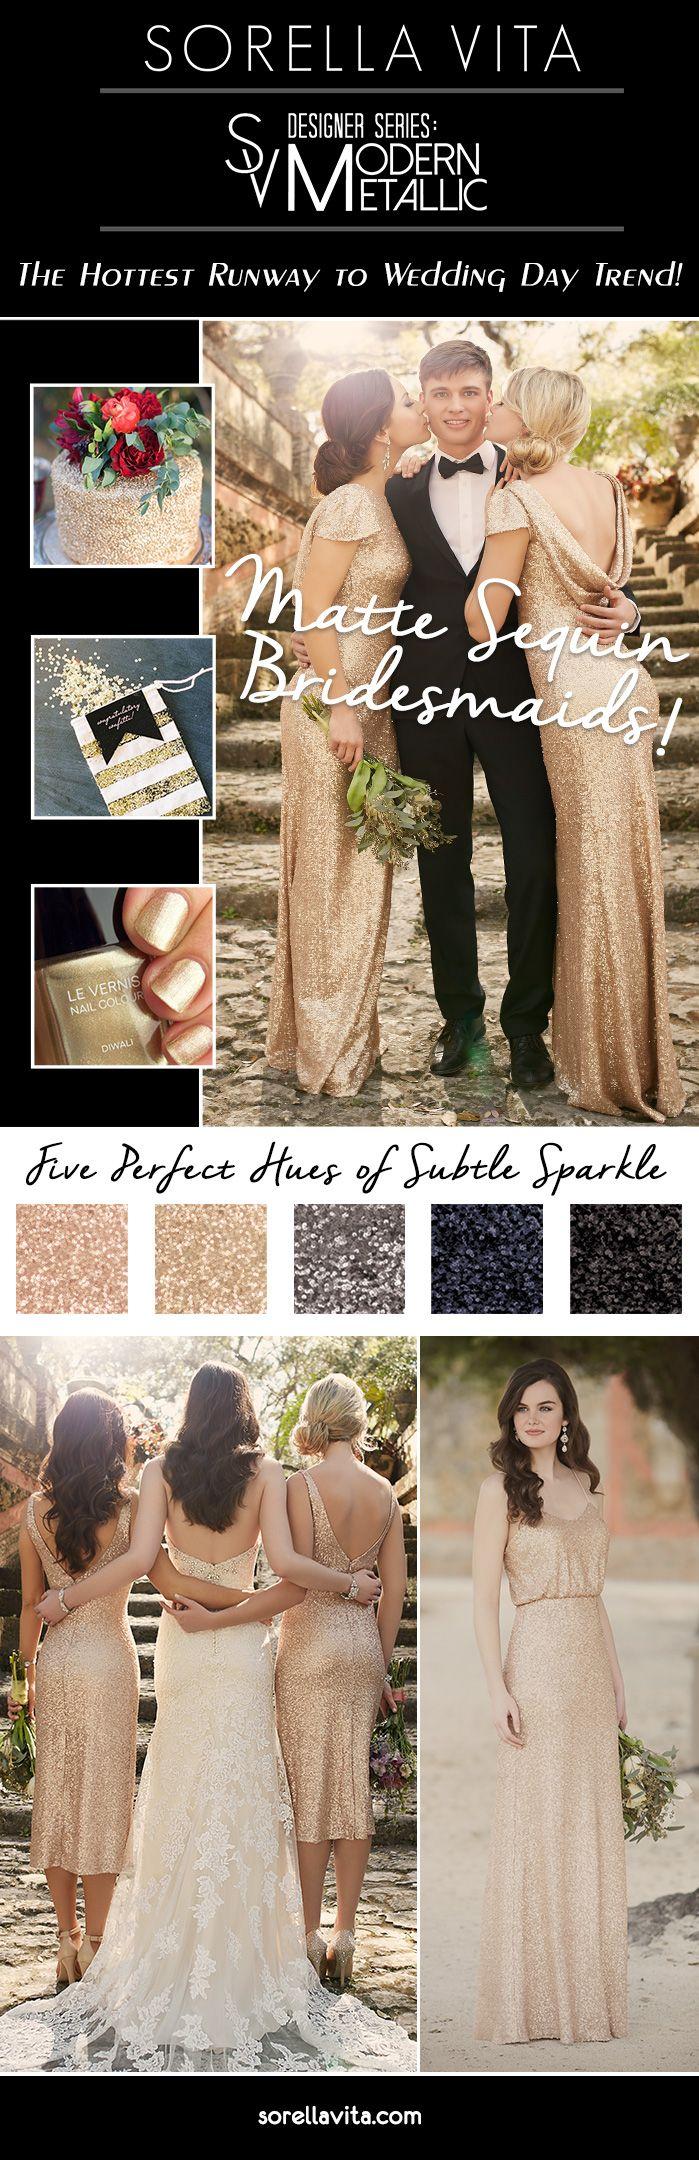 Turn up the glam factor with Sorella Vita Designer Series: Modern Metallic matte sequin bridesmaid dresses. 6 brand new styles in 5 amazing matte sequin colors!